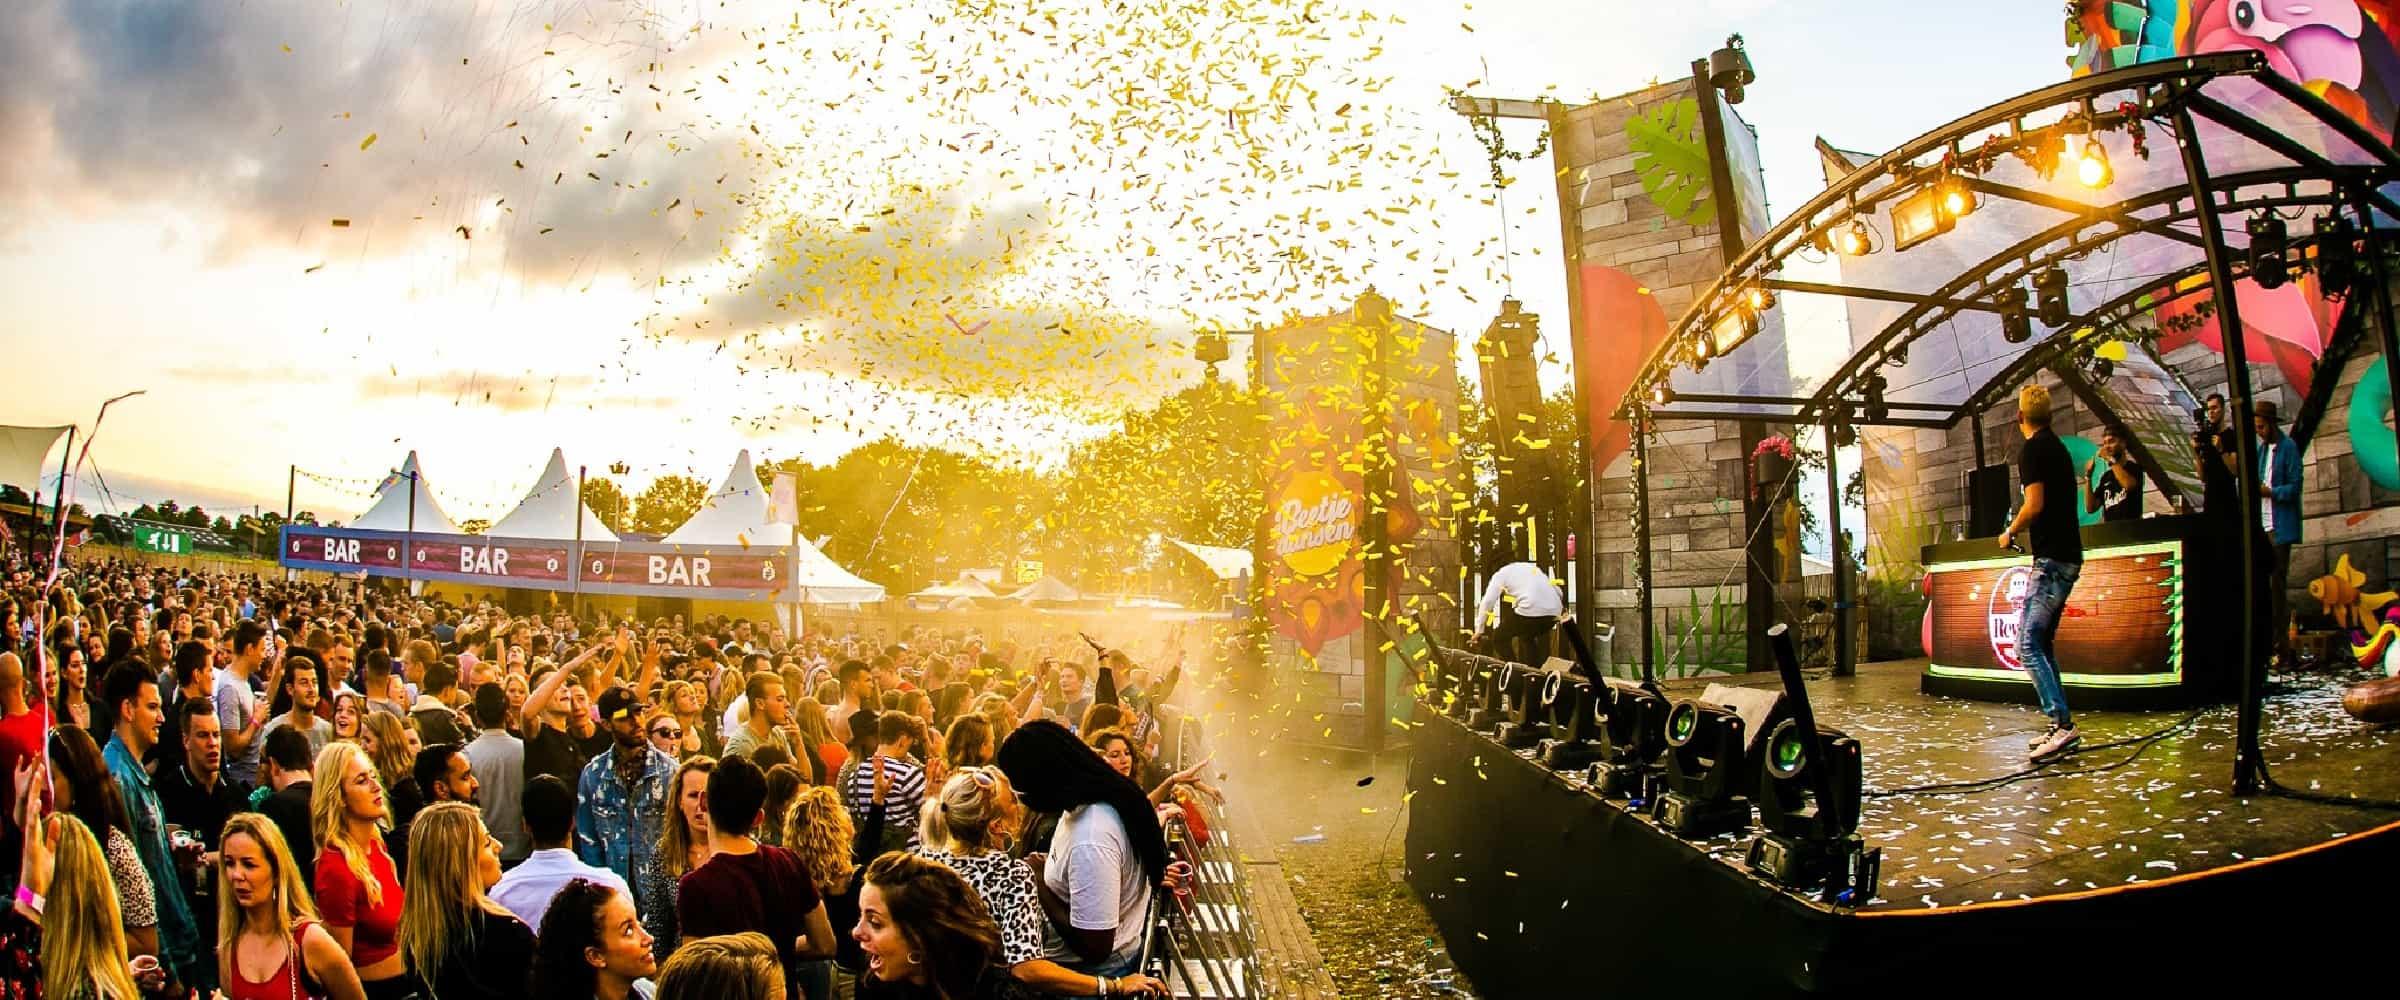 festival organiseren checklist